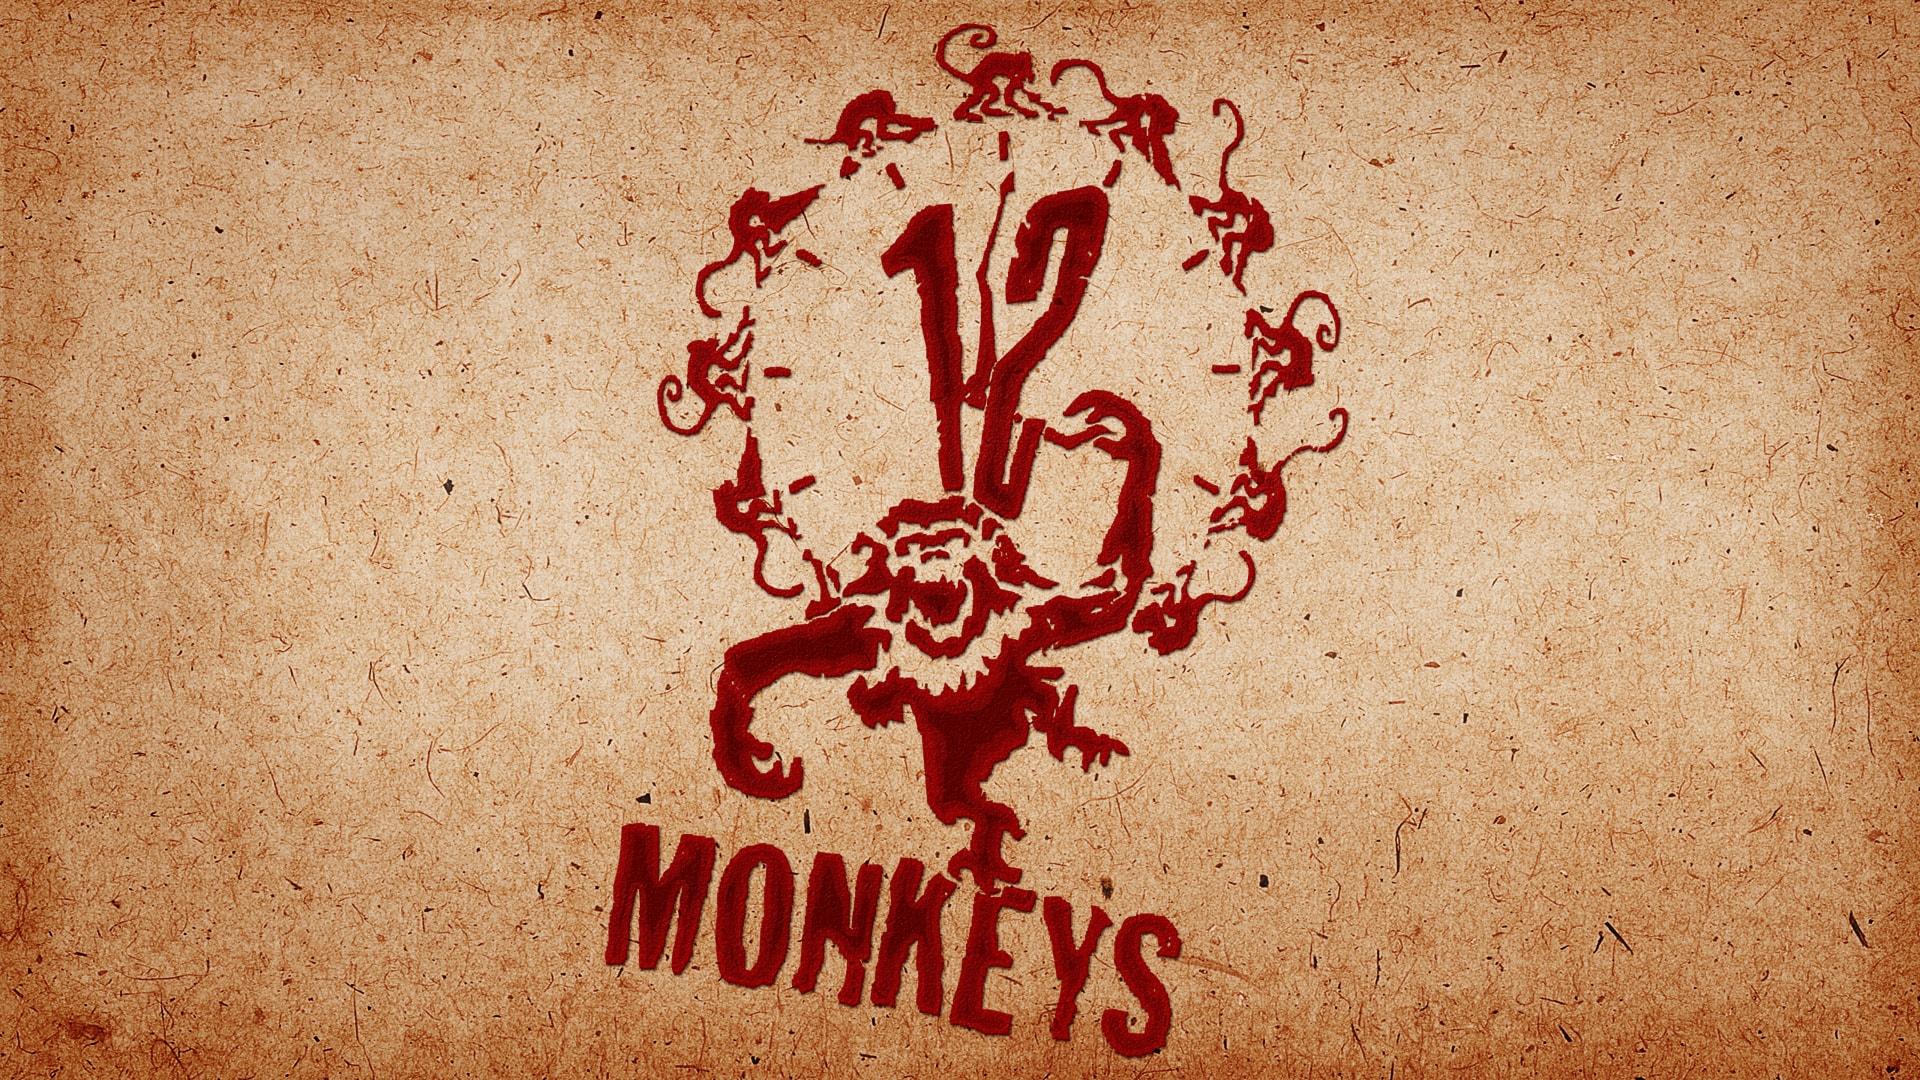 12 Monkeys widescreen wallpapers